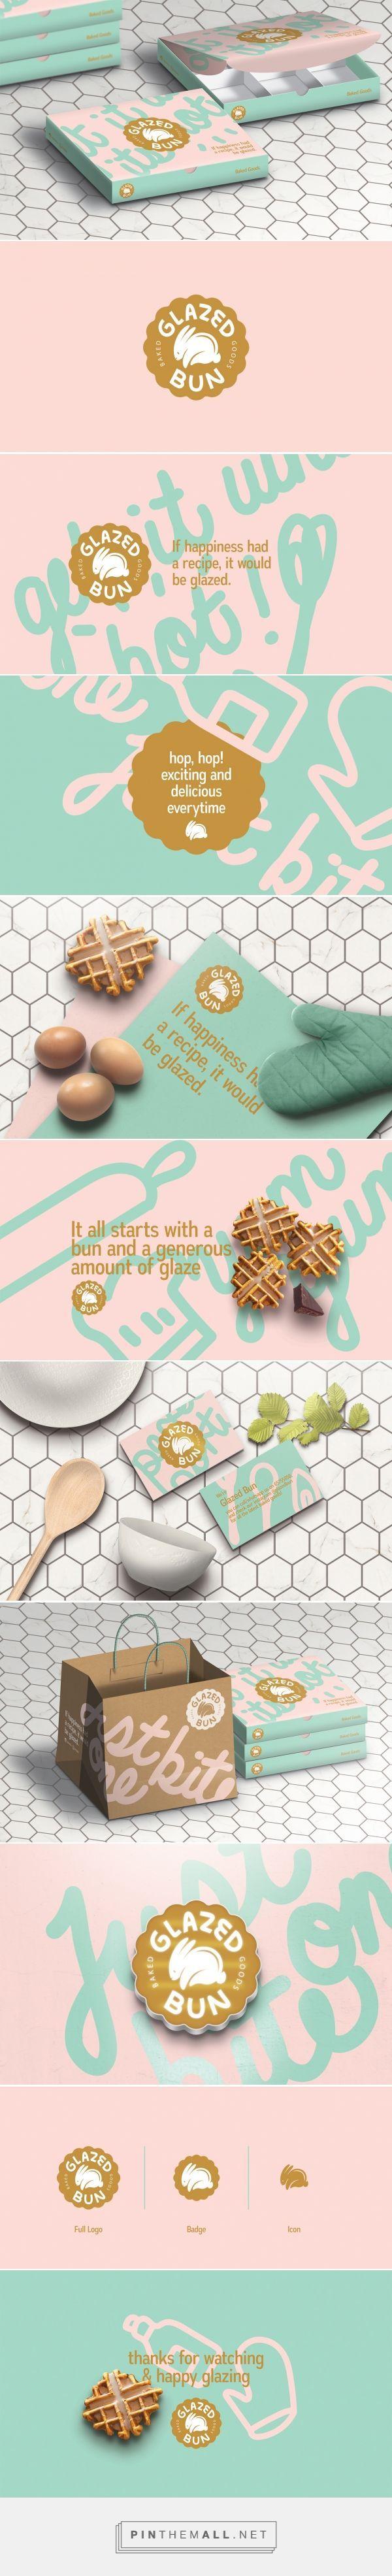 Glazed Bun Branding by Studio AIO on